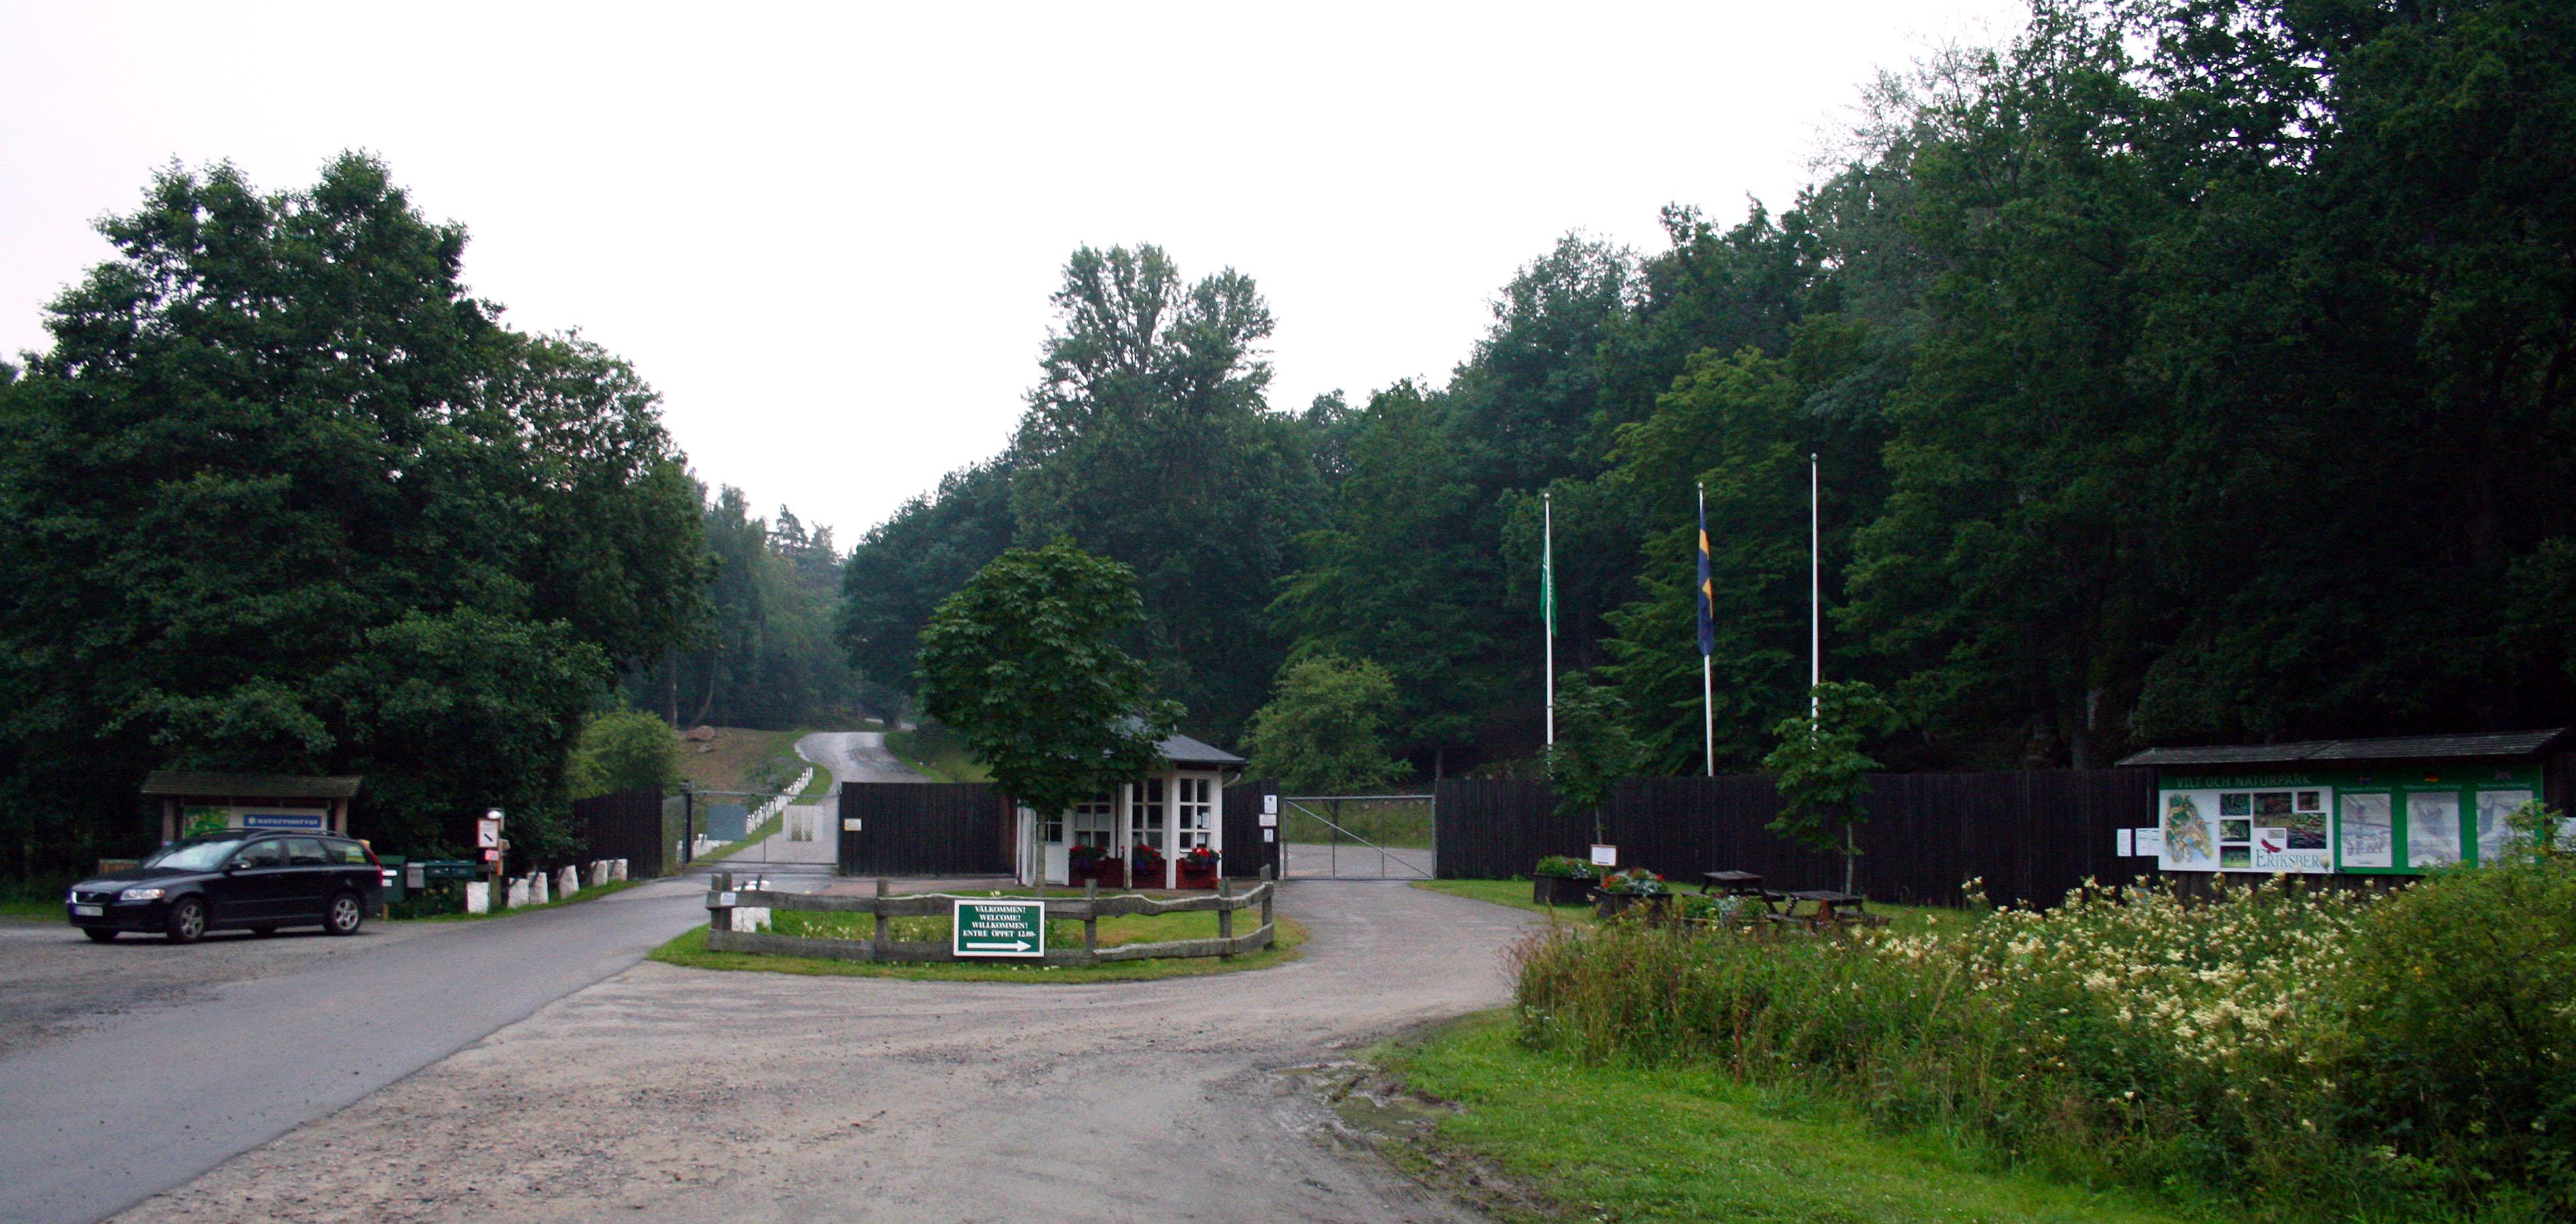 Vildt- og Naturpark Eriksberg